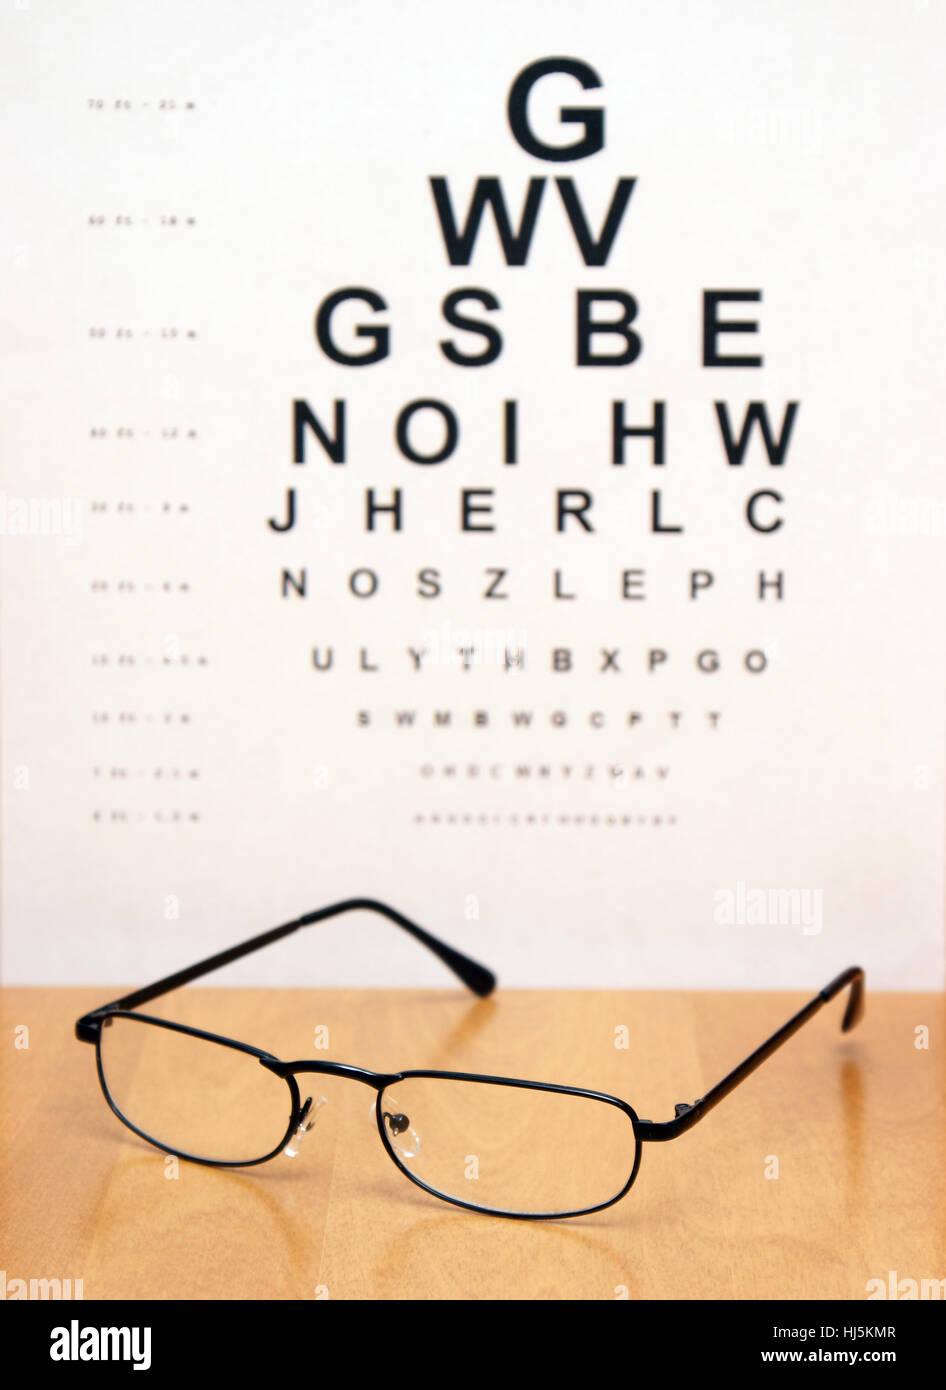 Glass chalice tumbler health medicinally medical chart eye glass chalice tumbler health medicinally medical chart eye organ nvjuhfo Gallery